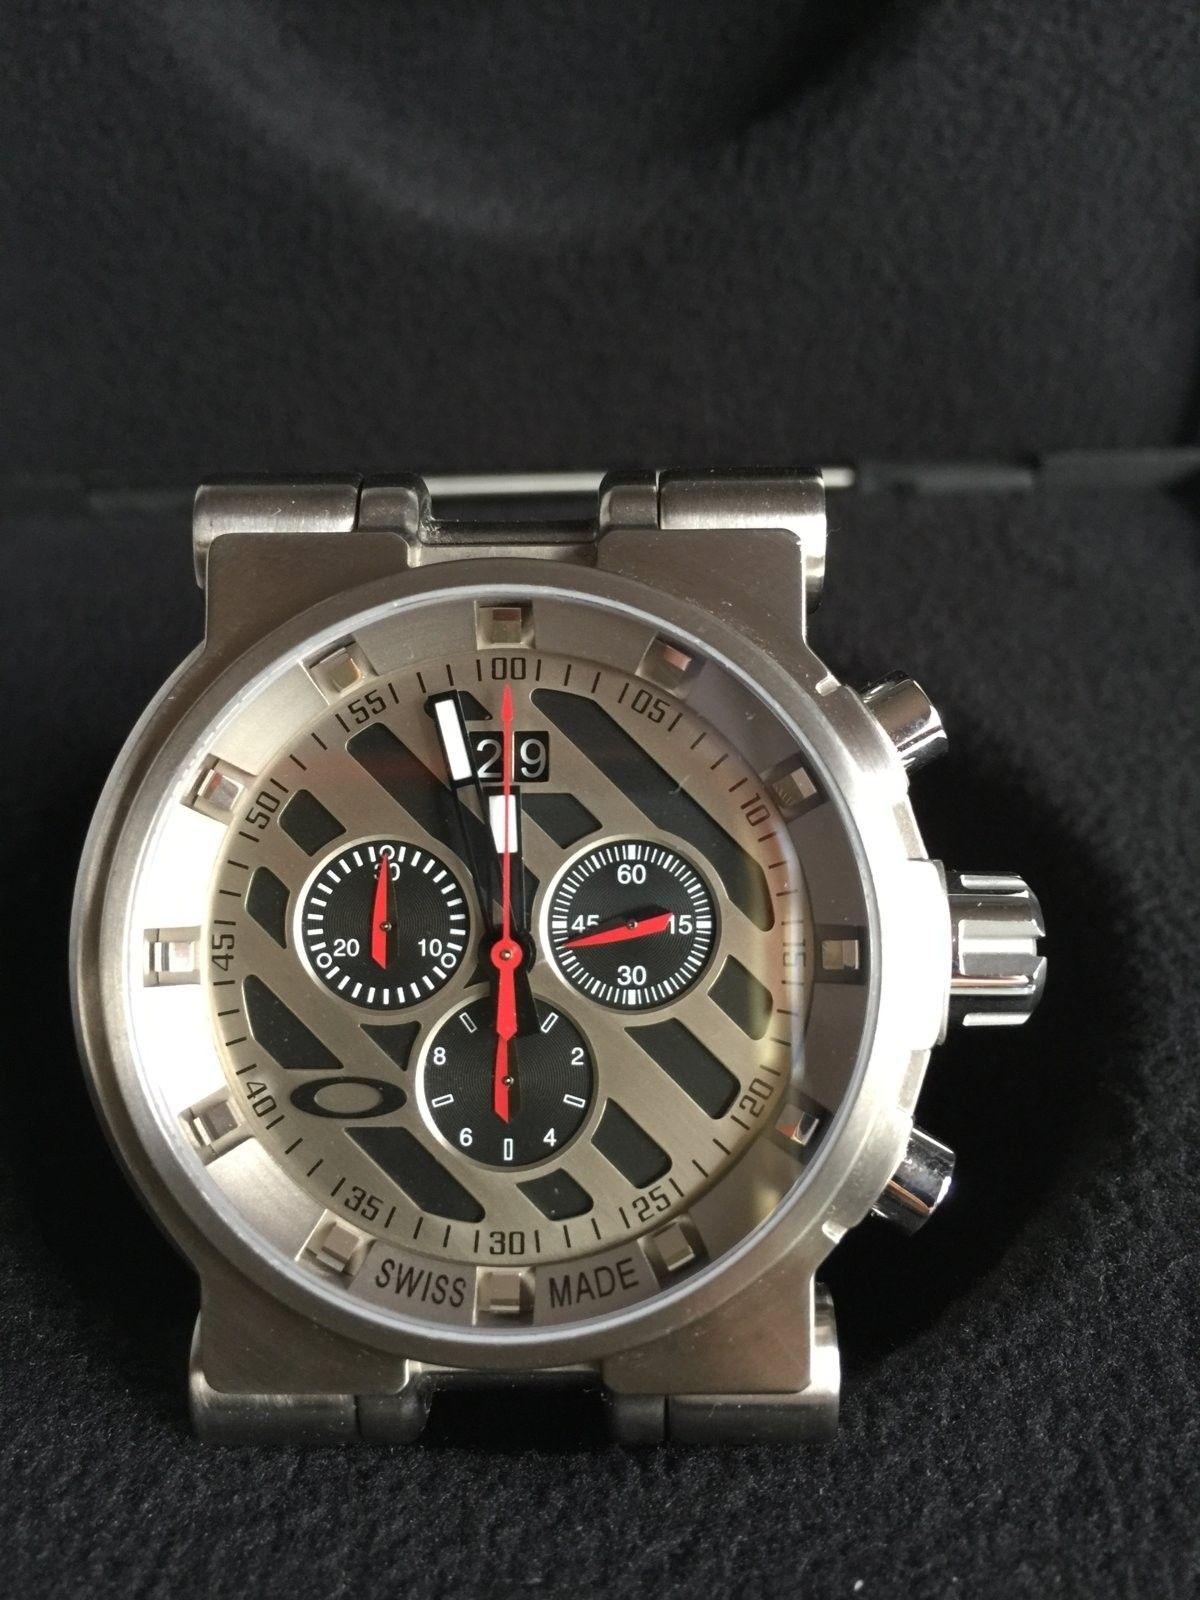 LNIB Black Dial Hollow Point watch - IMG_6063.JPG